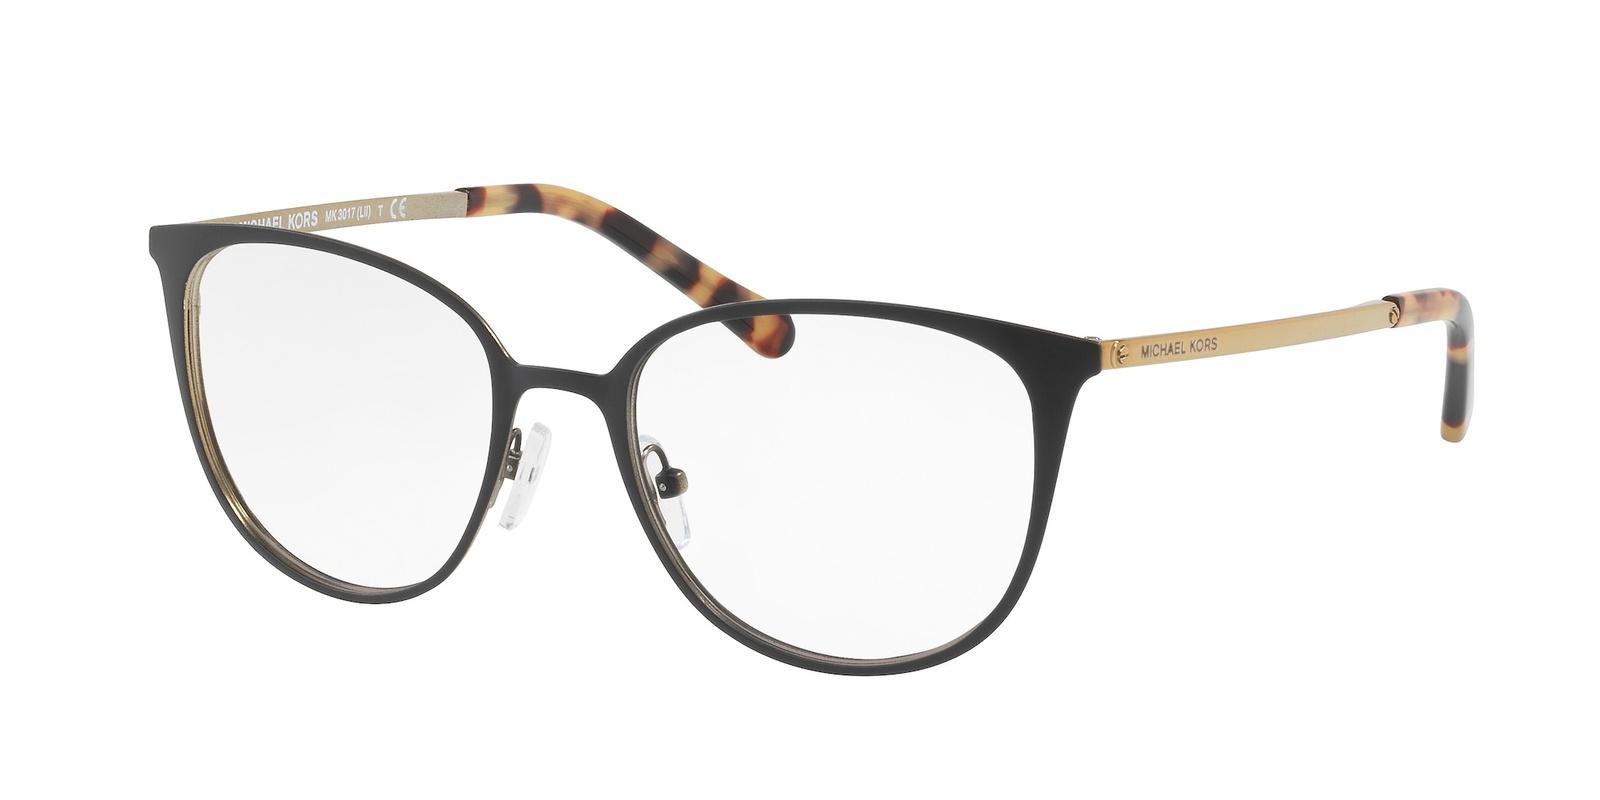 Michael Kors MK3017 LIL eyeglasses